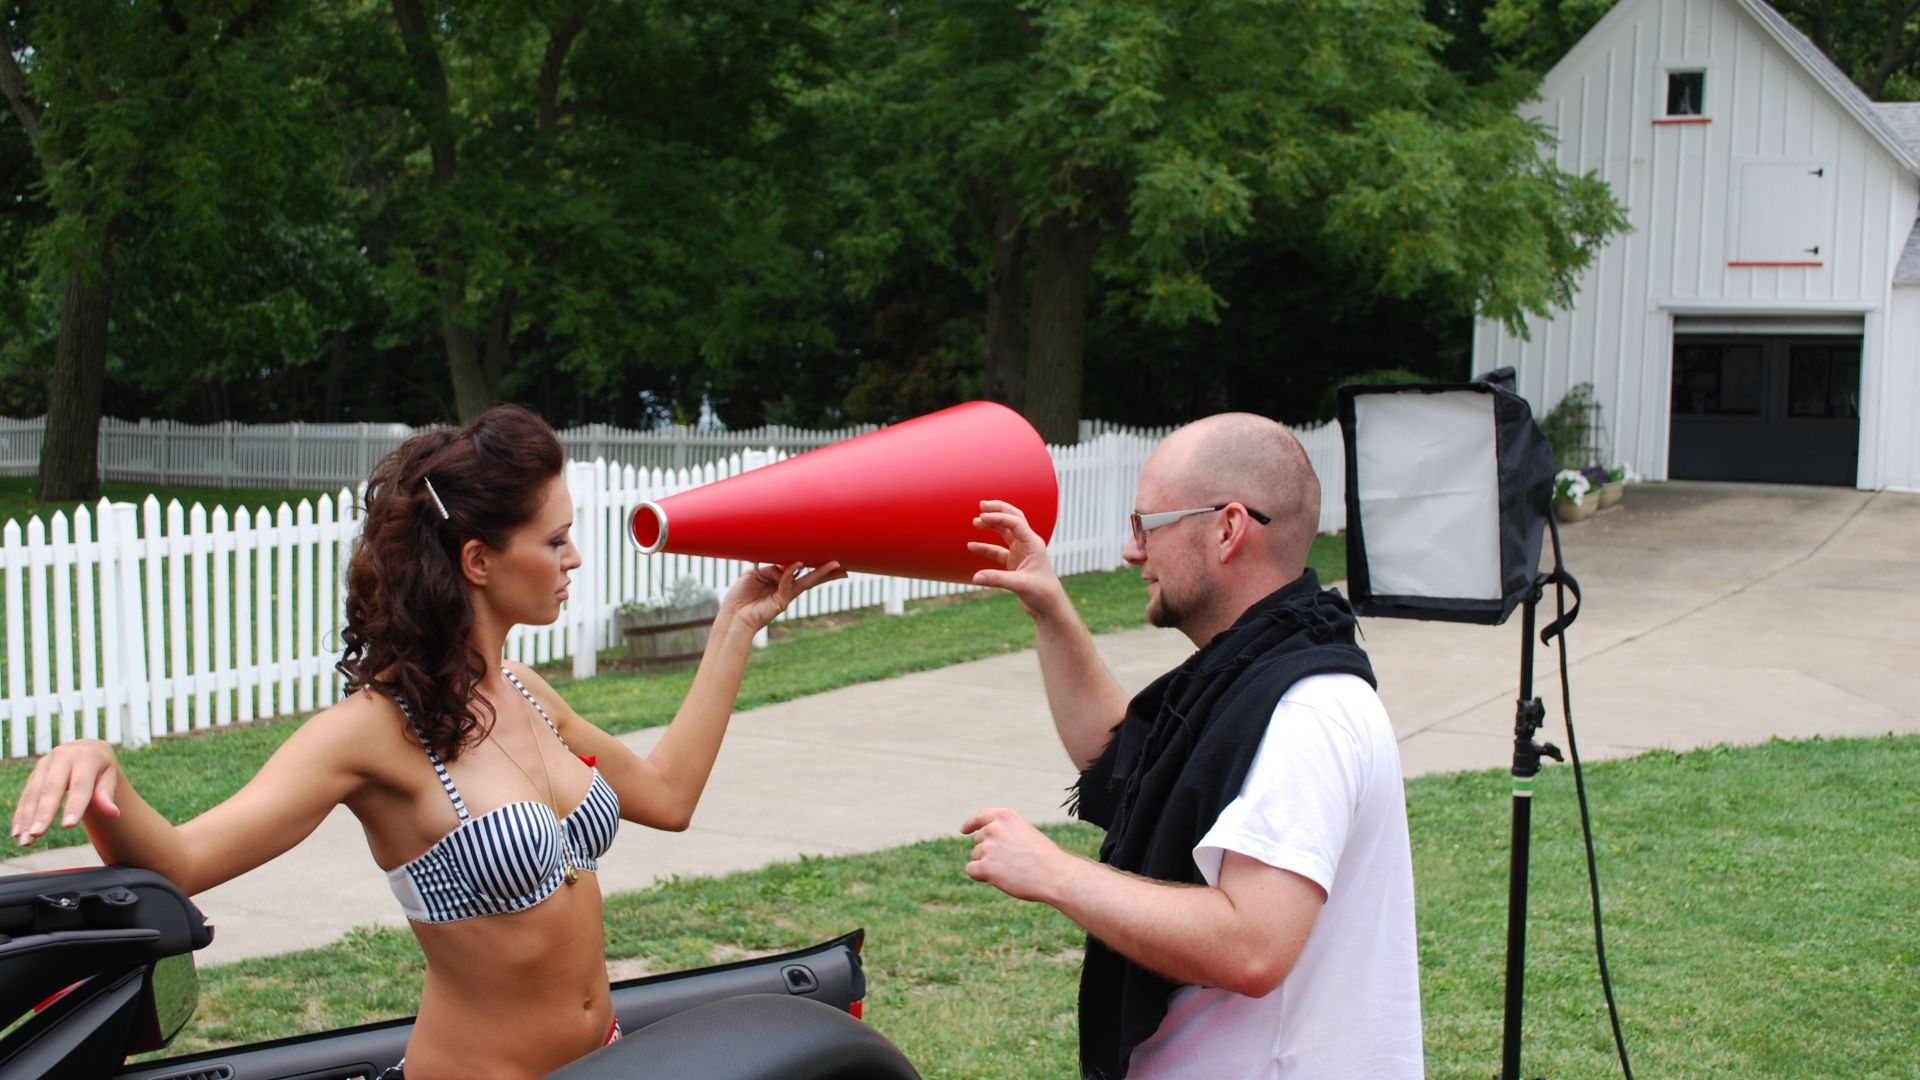 Immagine 25: Miss Tuning: il calendario 2011